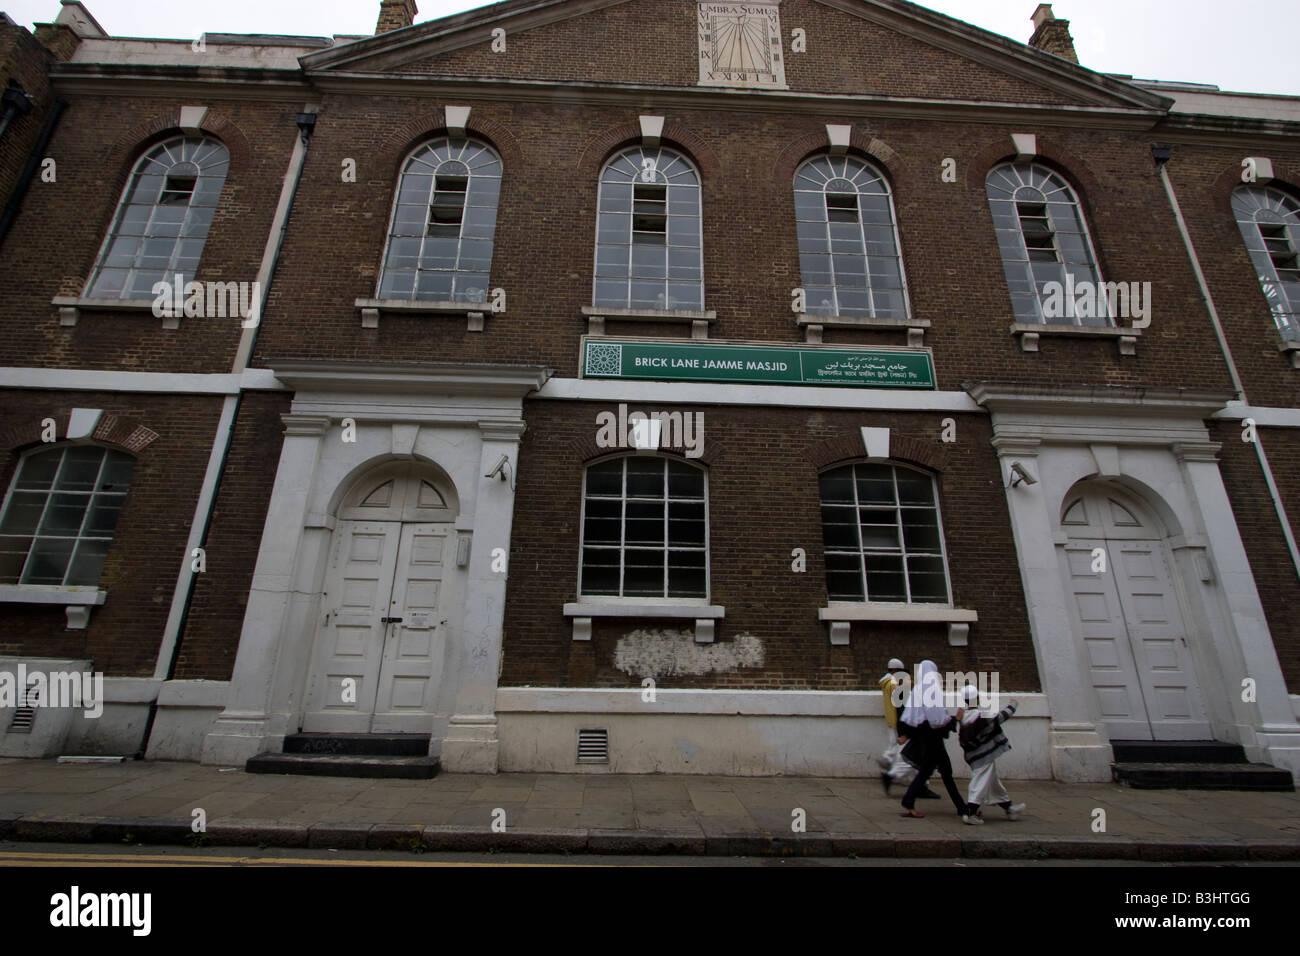 Brick lane The Brick Lane Jamme Mosjid The London Jamme Masjid located in the Spitalfields - Stock Image